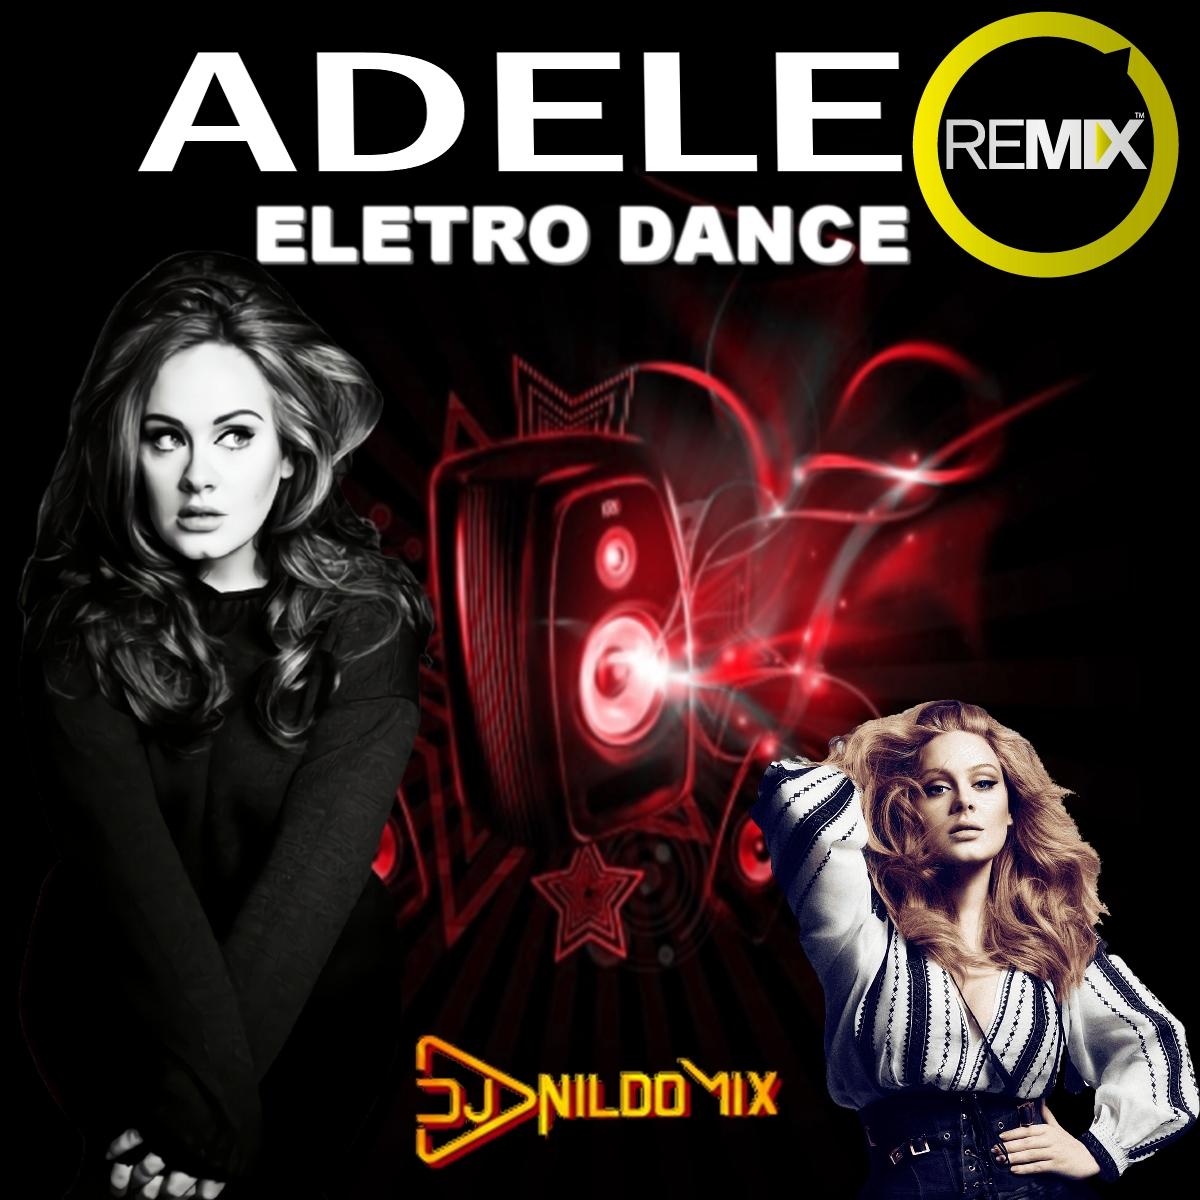 ADELE REMIX ELETRO DANCE 2021 DJ NILDO MIX